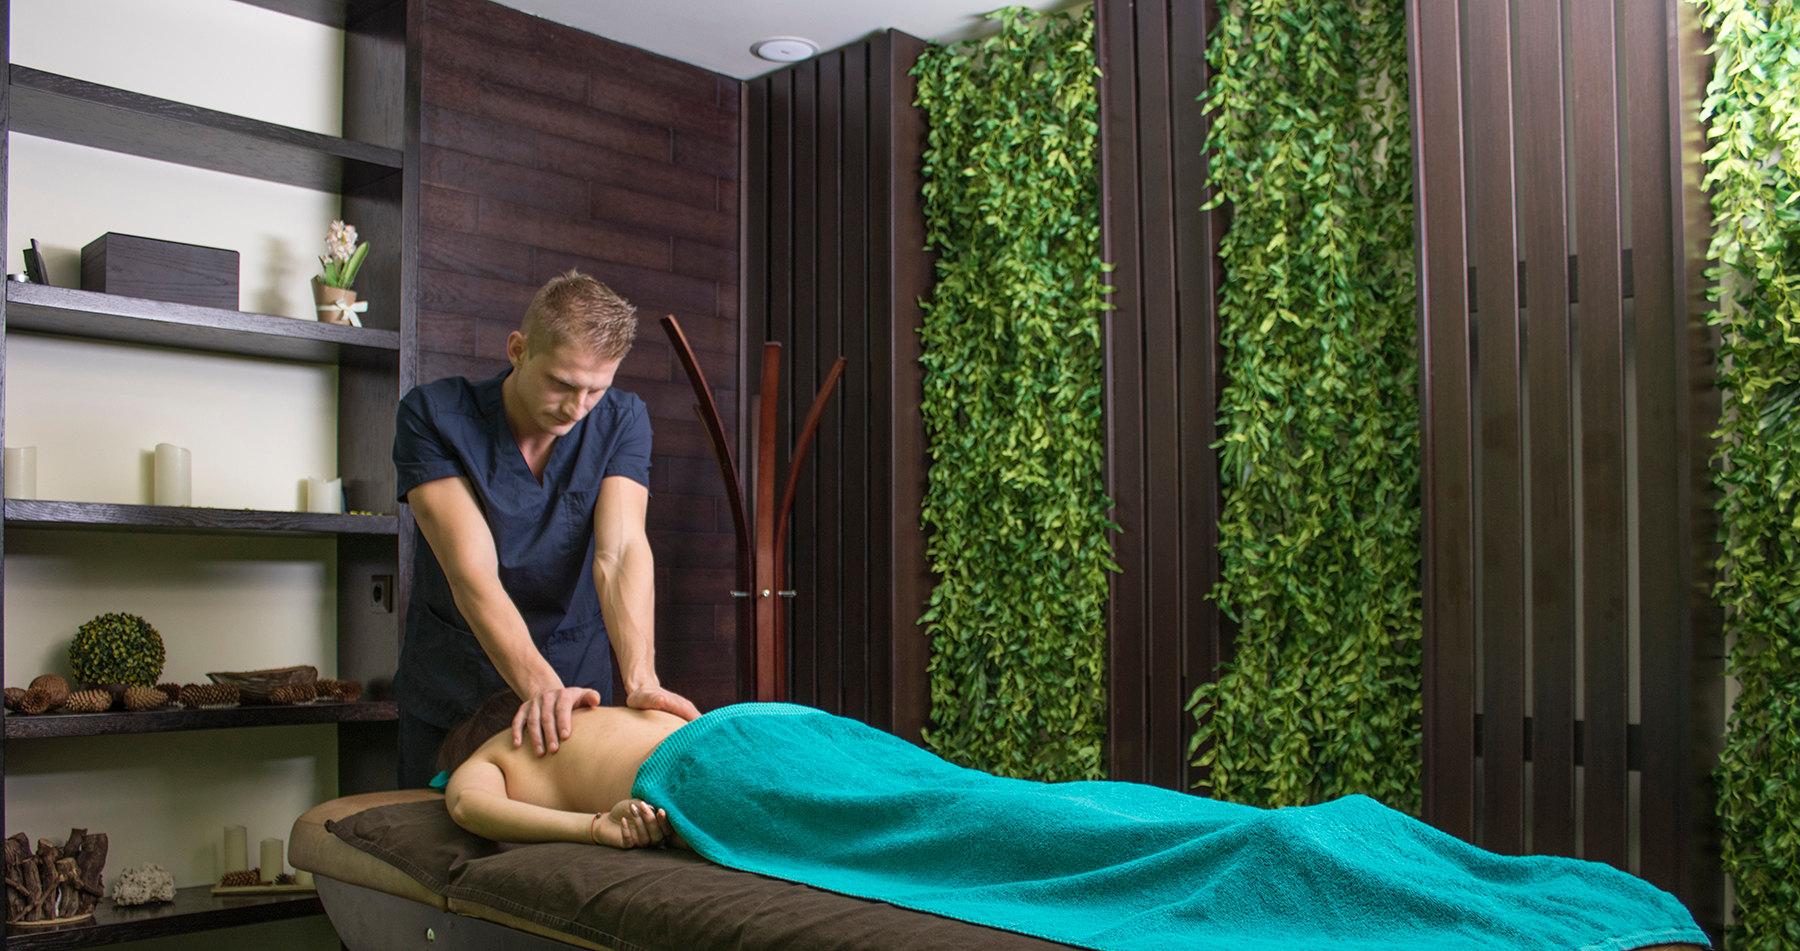 YONI SPA massages